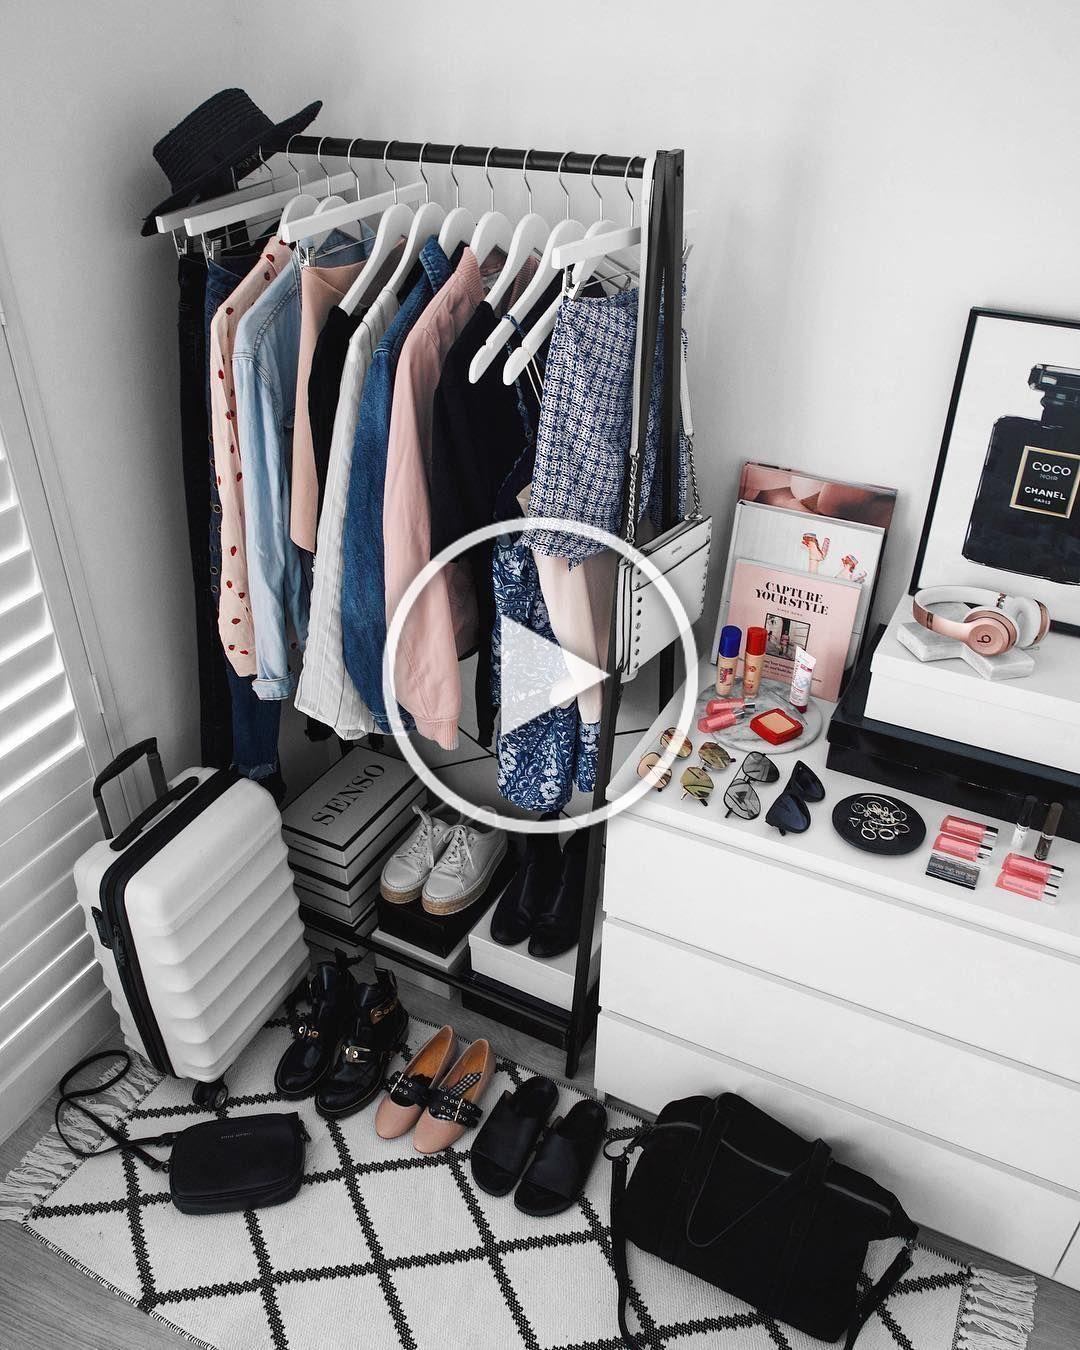 778 Otmetok Nravitsya 15 Kommentariev Kiara King Style In 2020 Room Decor Bedroom Room Decor Aesthetic